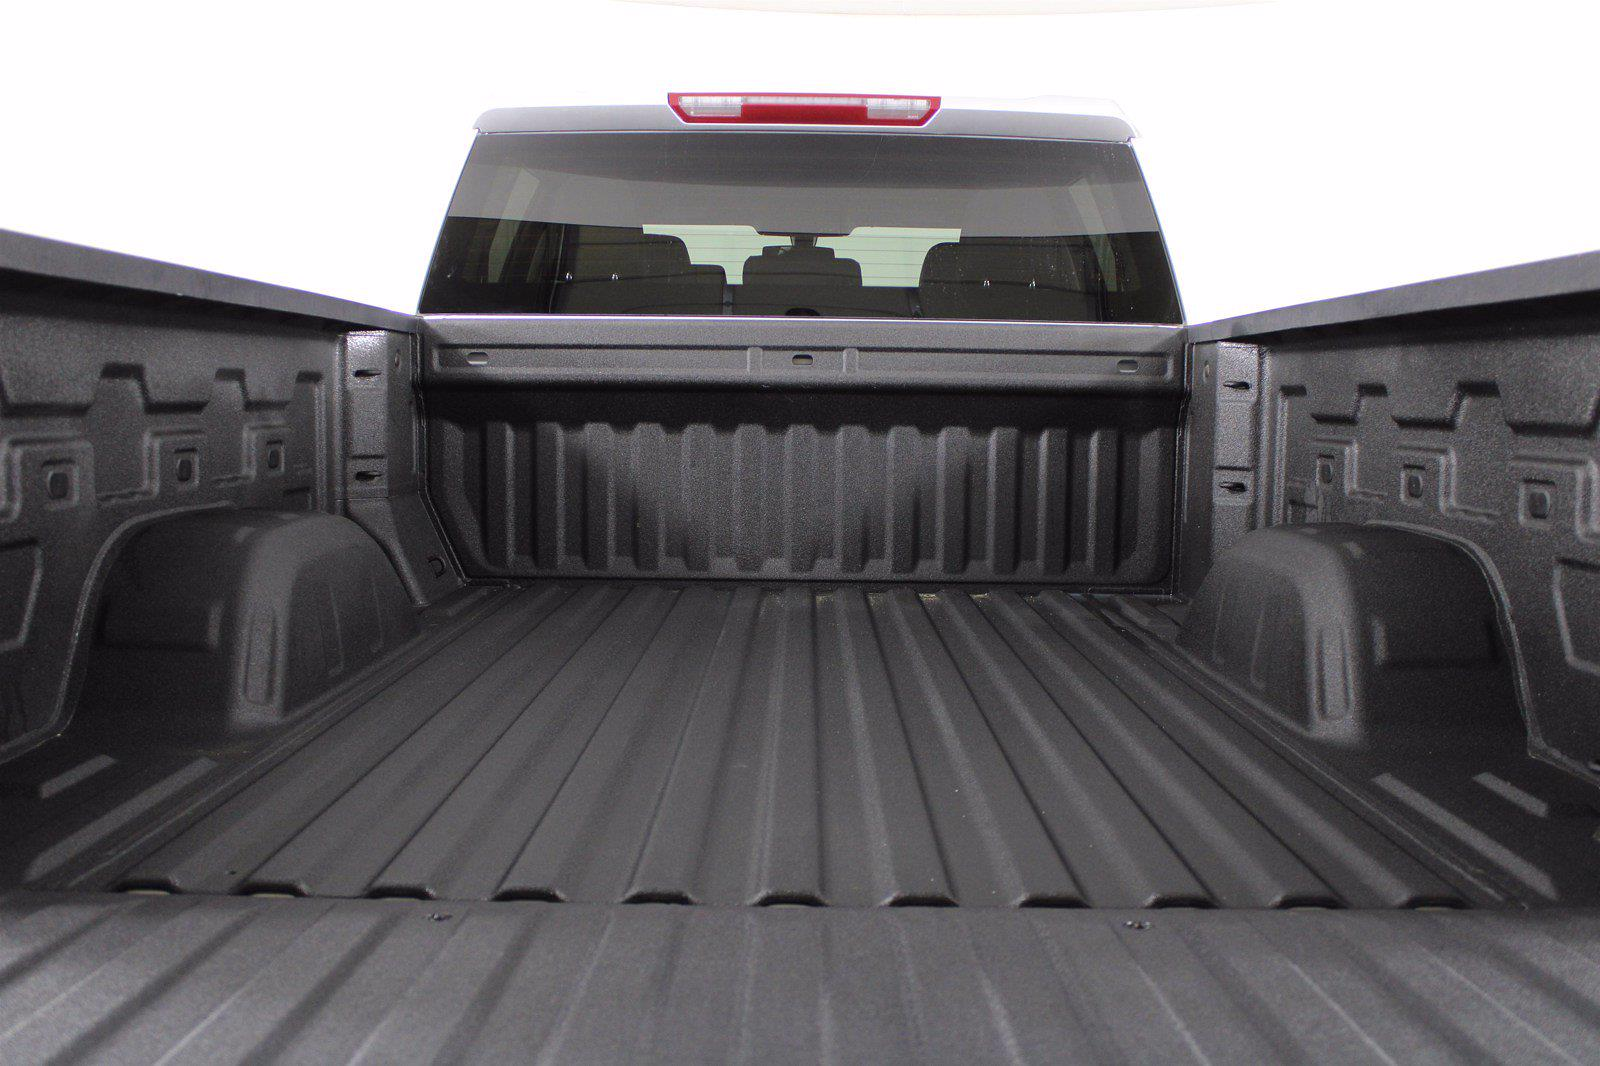 2020 Chevrolet Silverado 1500 Crew Cab 4x4, Pickup #D110855A - photo 2